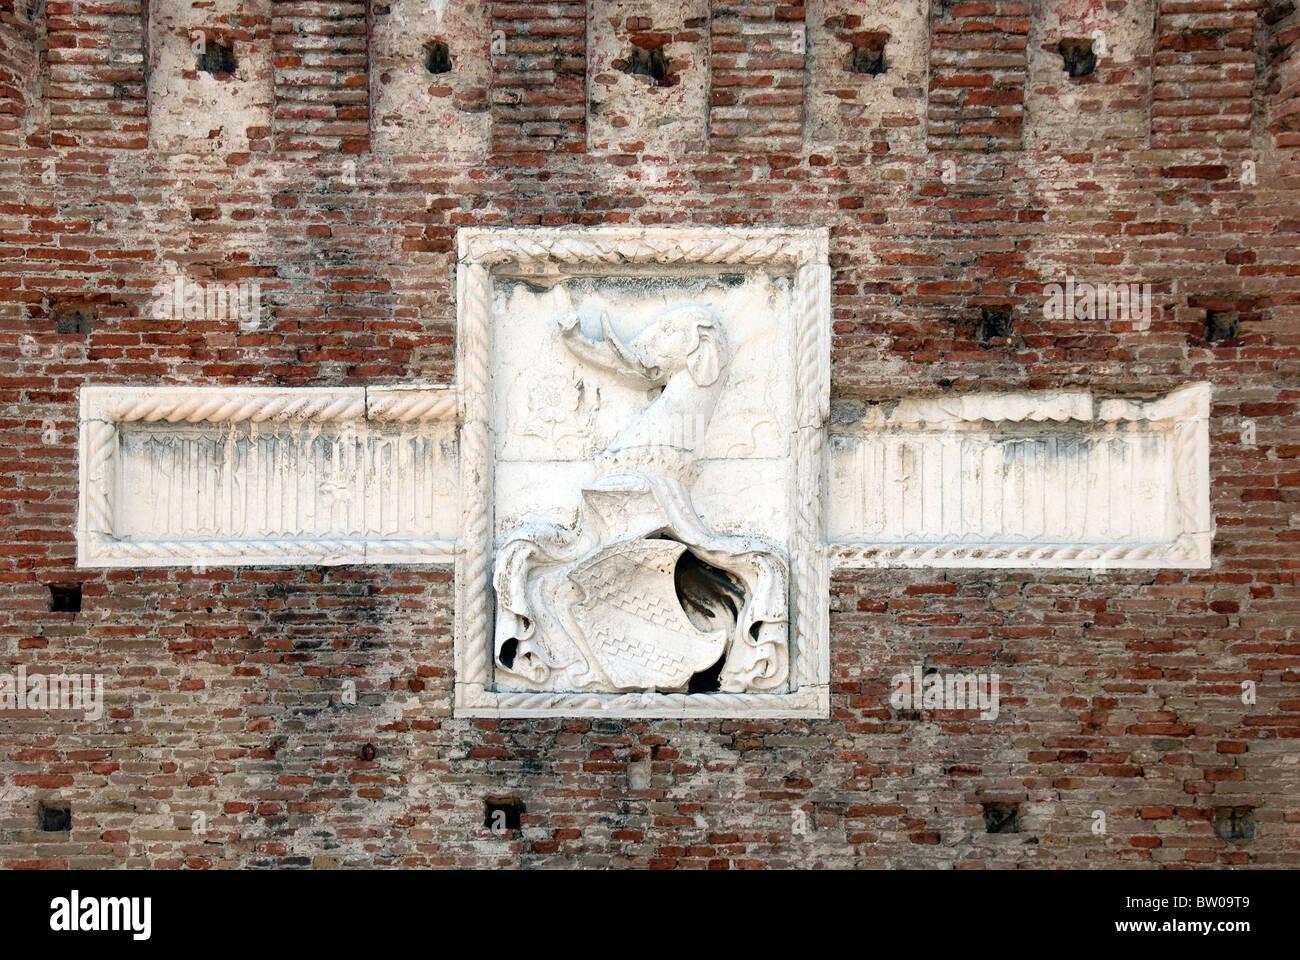 Healdic sheild on the  front of Fortezza Malatesta, Rimini, Emilia-Romagna, Italy - Stock Image